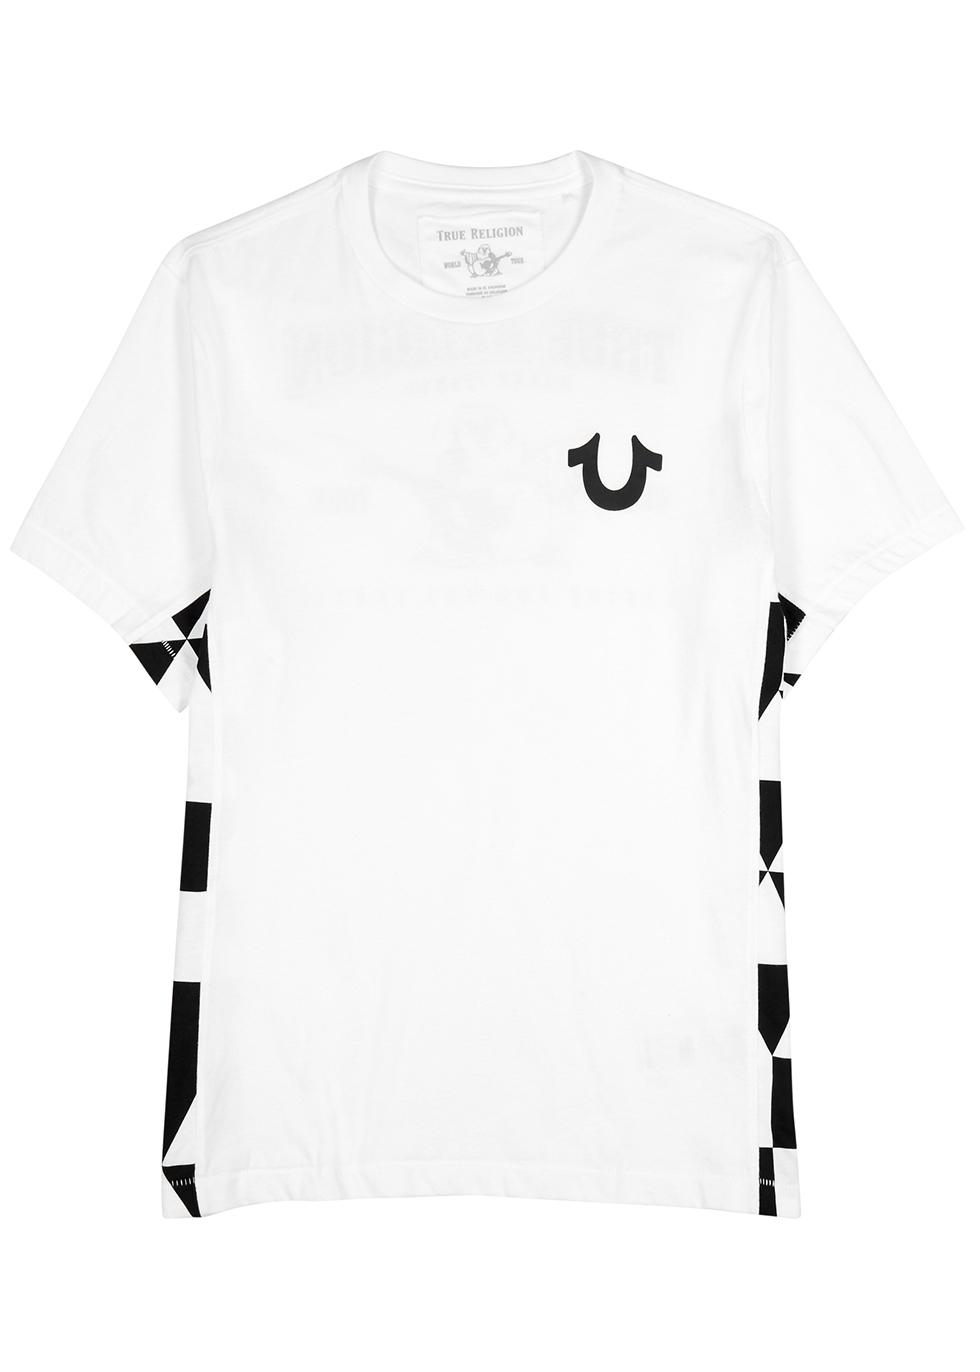 52712709025 True Religion White Buddha-print cotton T-shirt - Harvey Nichols